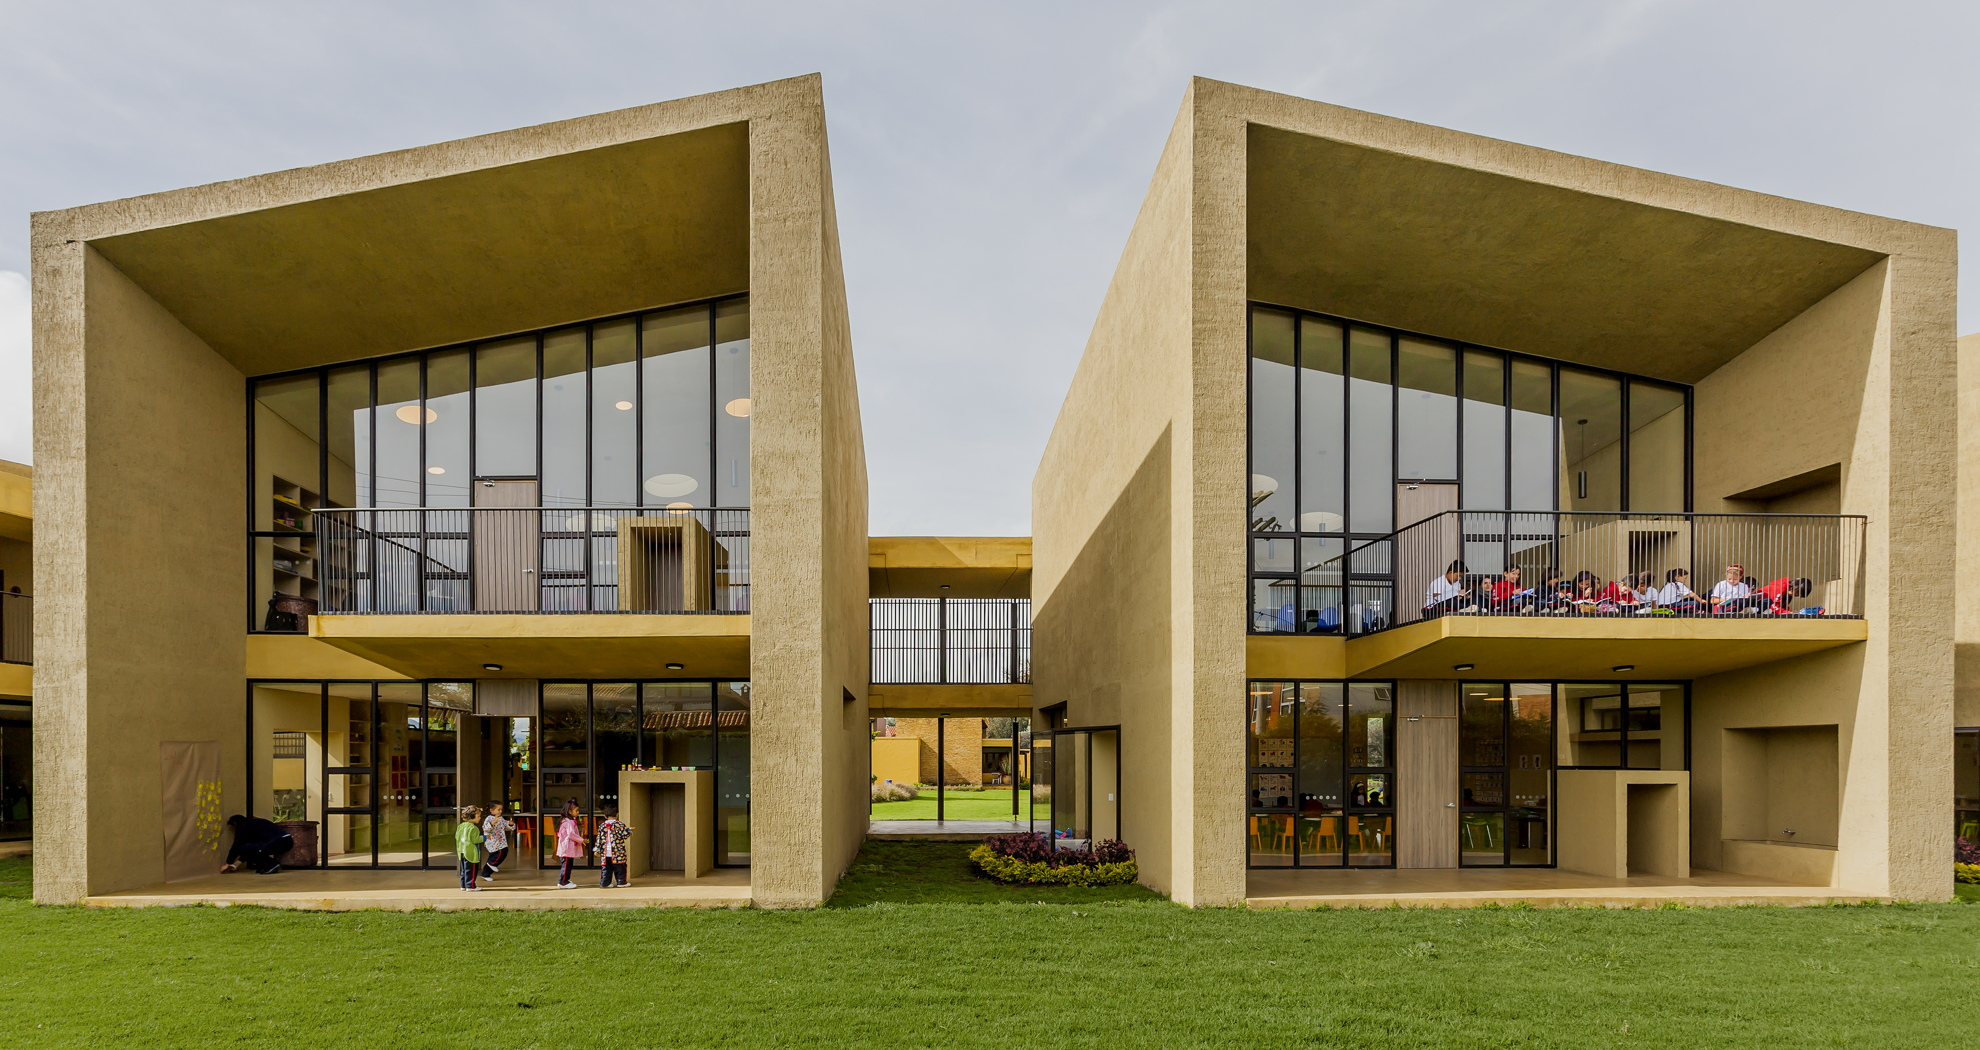 Taller de Arquitectura de Bogota: San Jose nursery school in ...